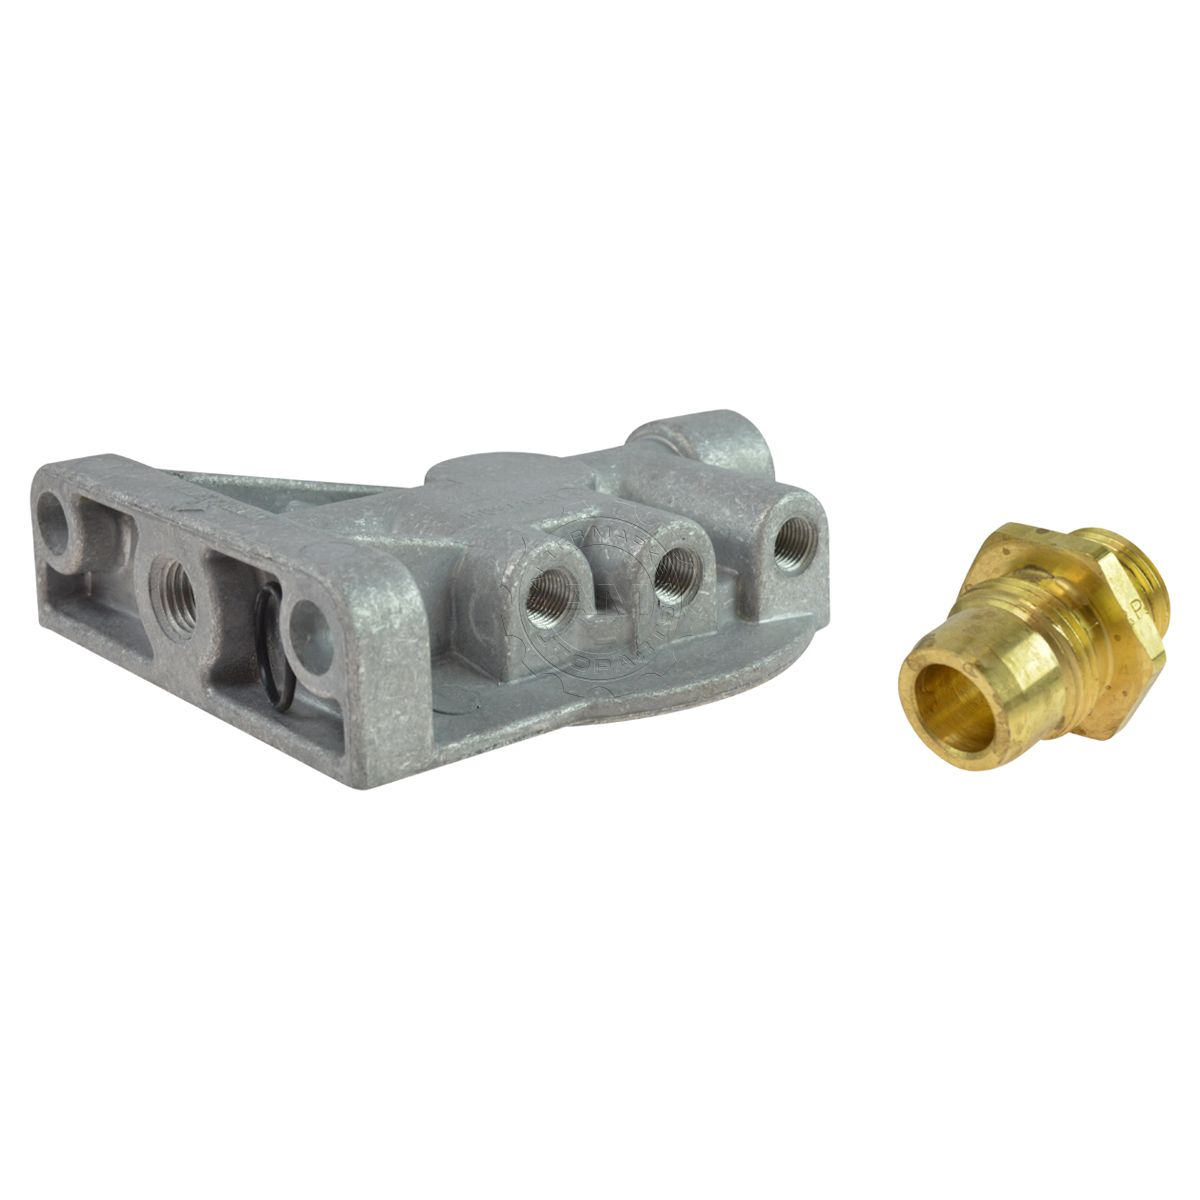 OEM Diesel Fuel Filter Housing Header for Ford F150 F250 F350 E-150 6.9L